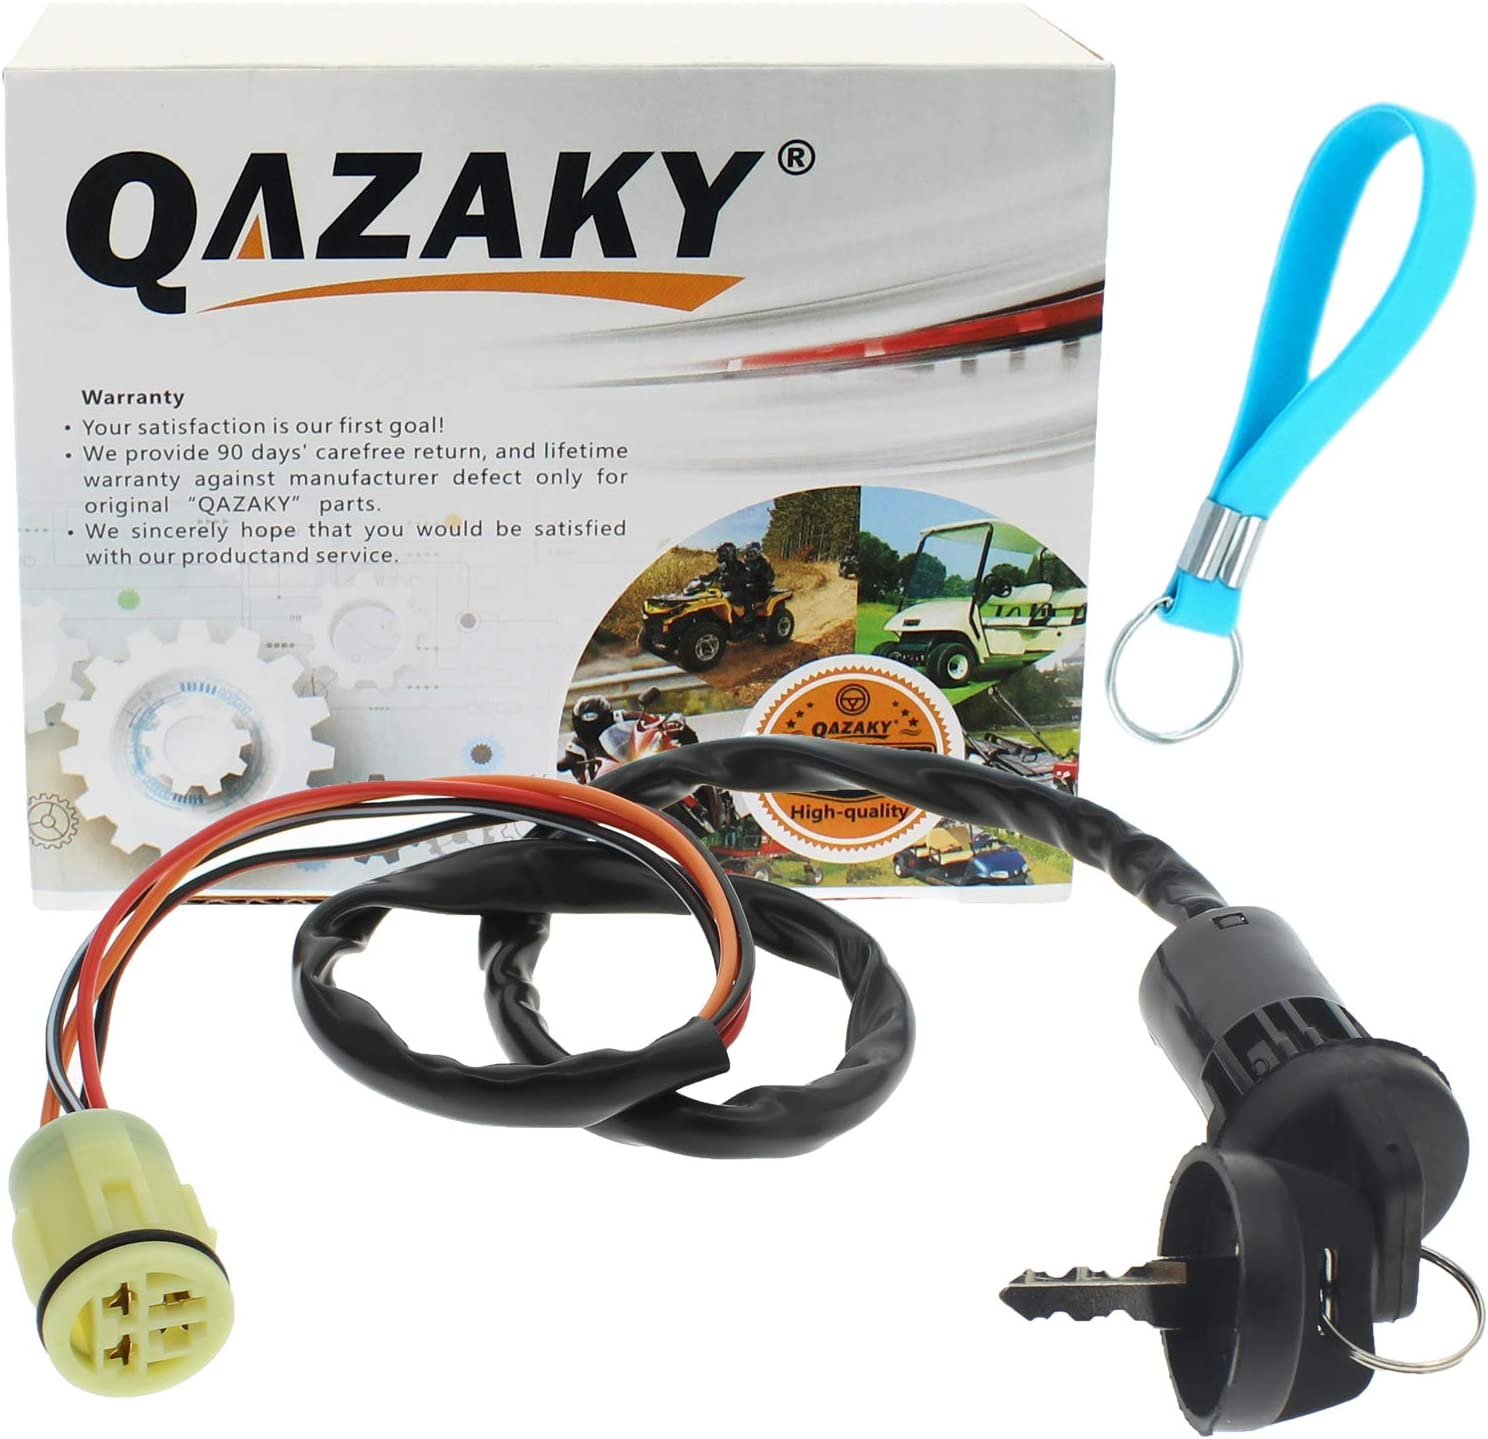 QAZAKY Ignition Key Switch Compatible for Foreman 450 Rubicon 500 Rincon 650 680 TRX450 TRX450ES TRX450FE TRX450FM TRX450S TRX500 TRX500FA TRX500FE TRX500FGA TRX500FM TRX500FPA TRX650 TRX680 TRX680FA